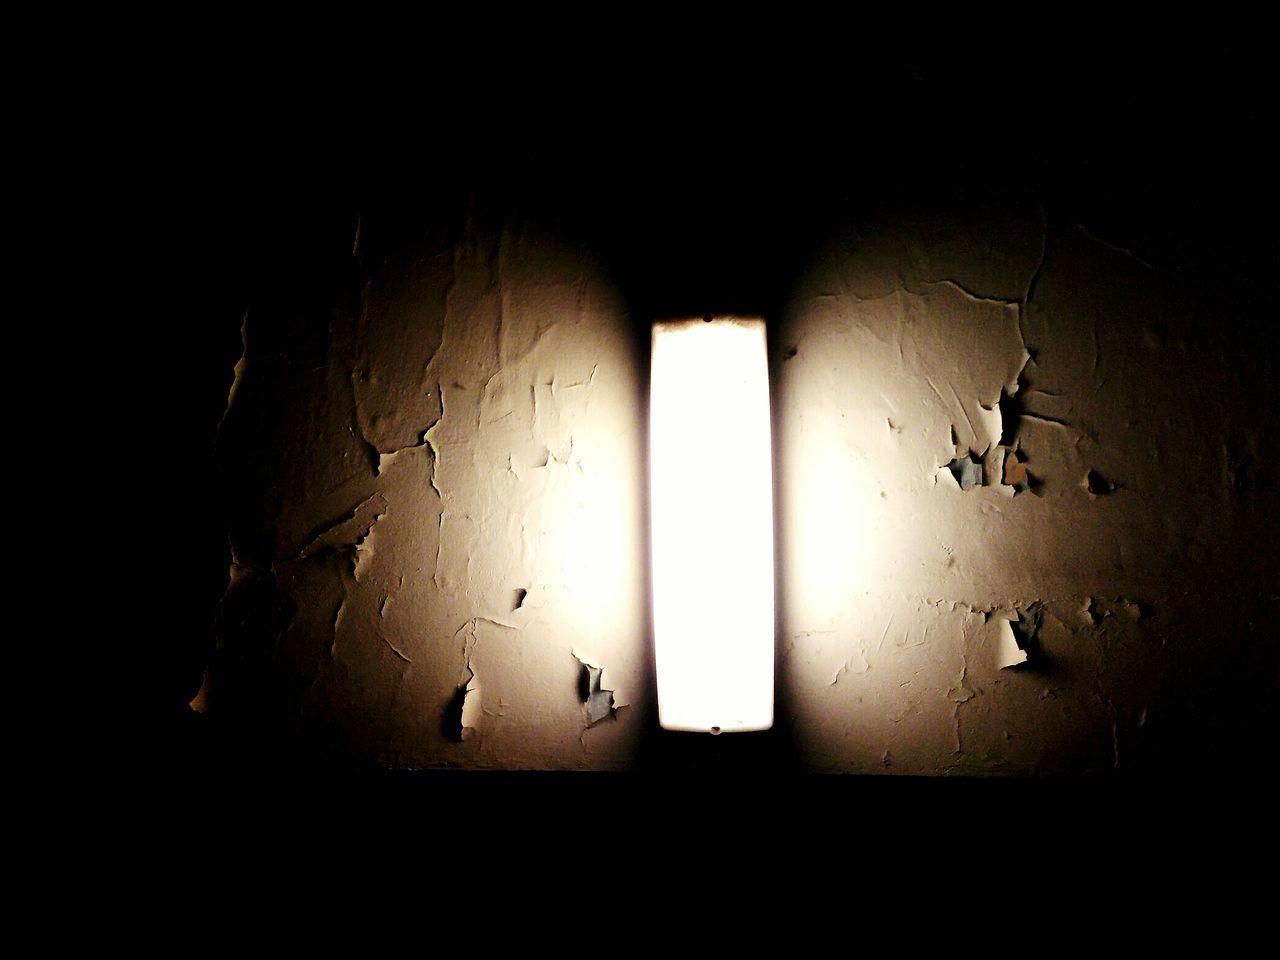 illuminated, dark, indoors, no people, night, architecture, close-up, prison